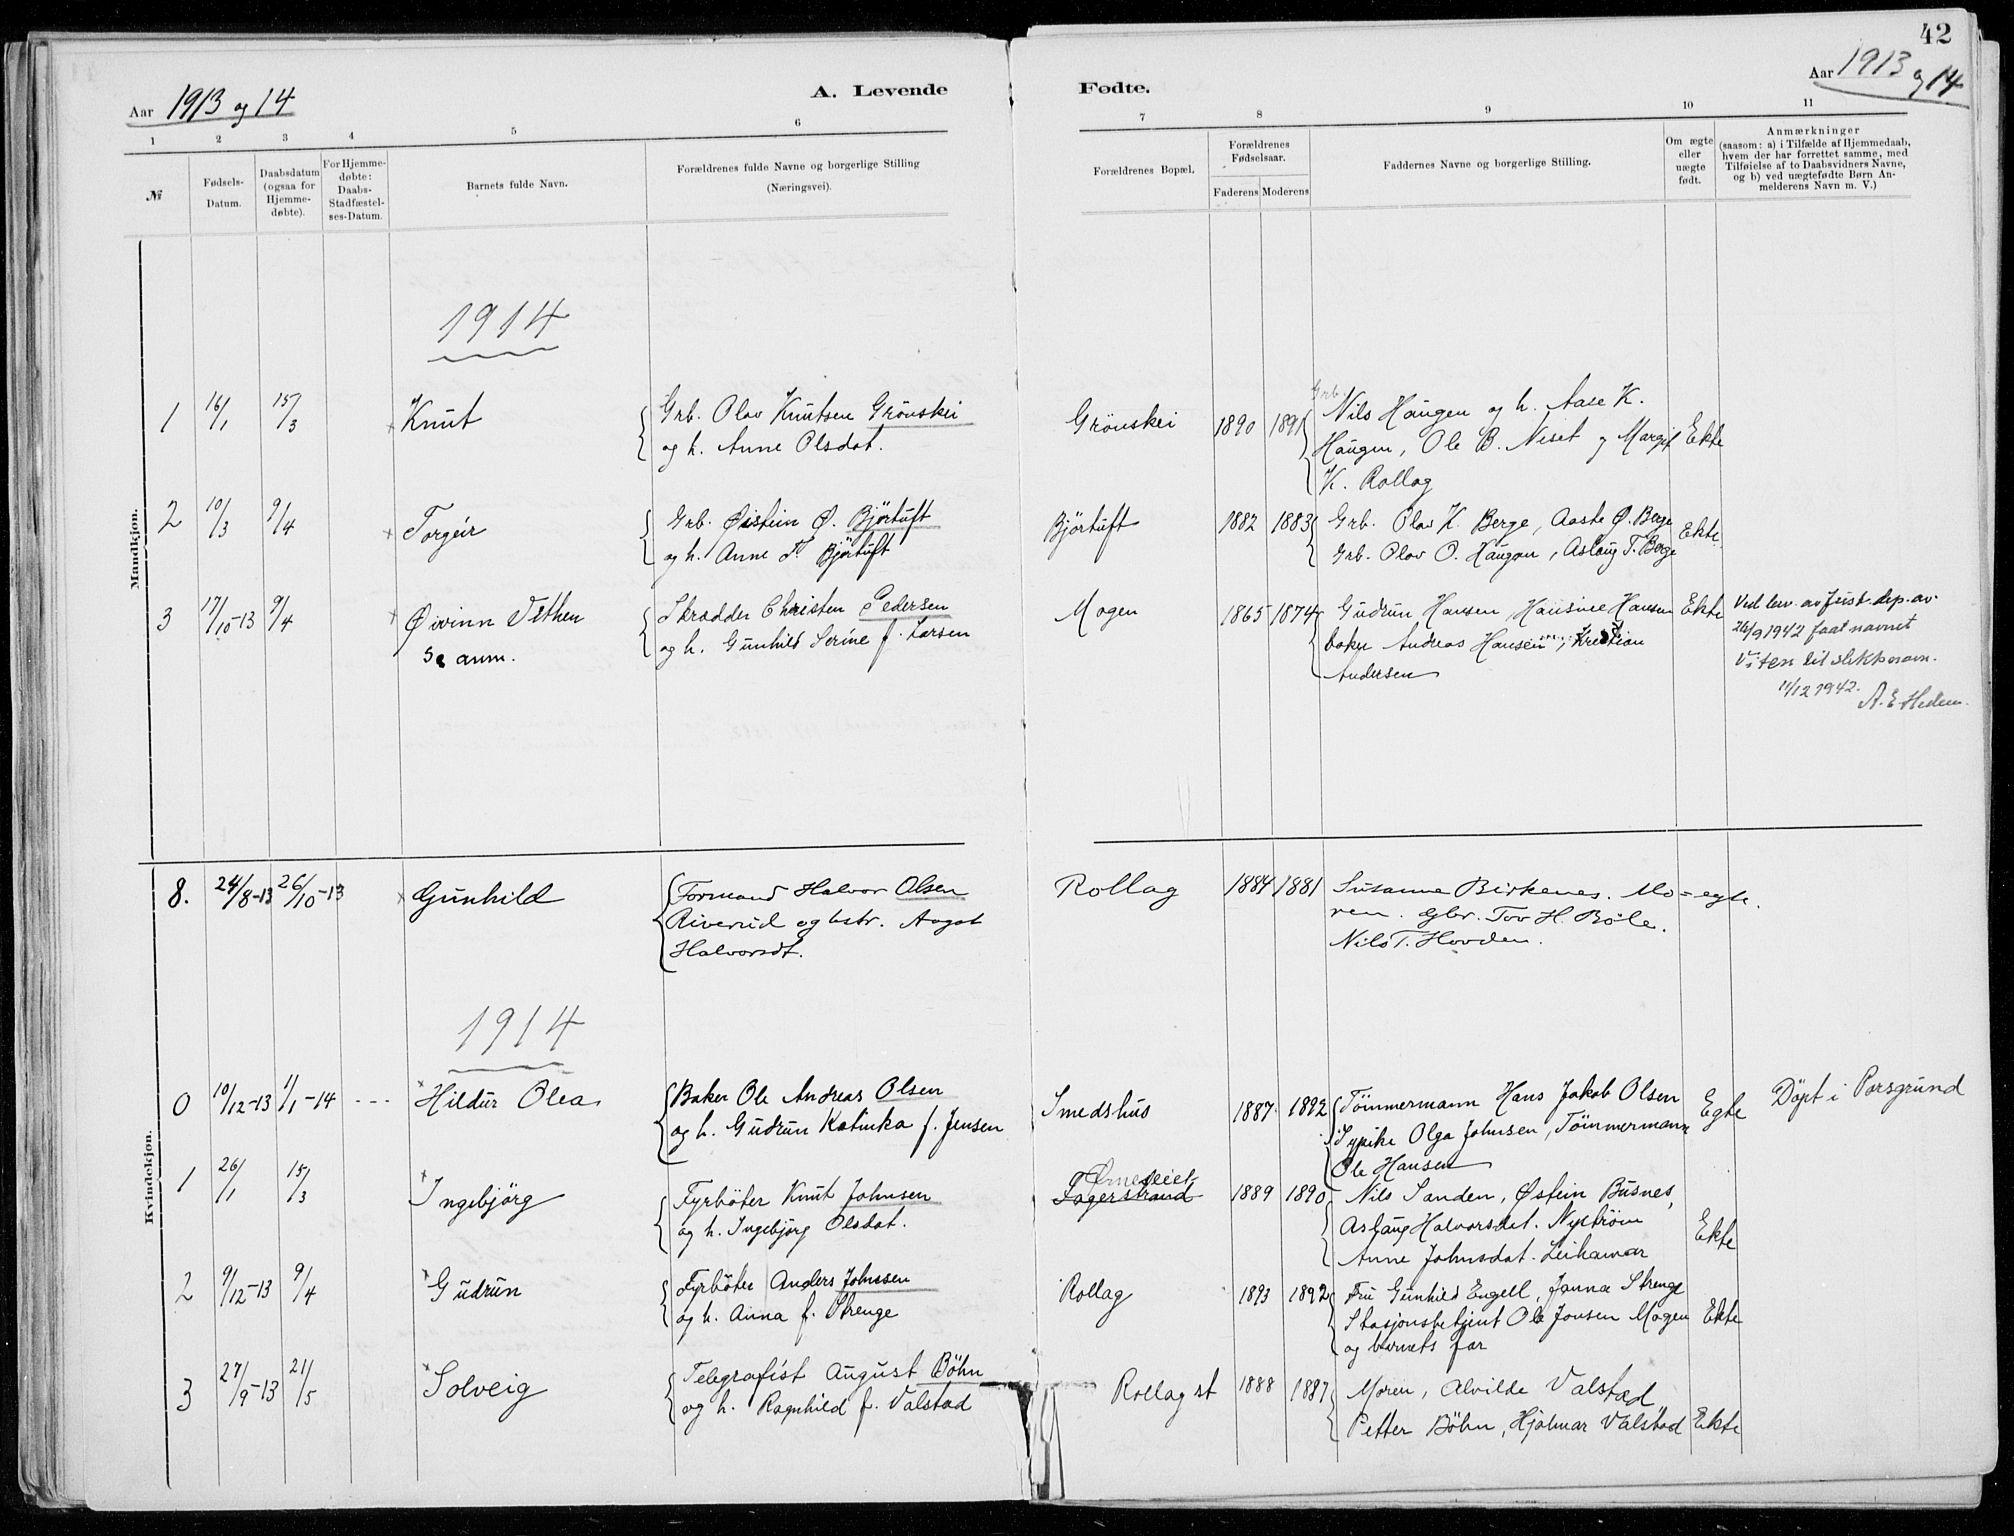 SAKO, Tinn kirkebøker, F/Fb/L0002: Ministerialbok nr. II 2, 1878-1917, s. 42